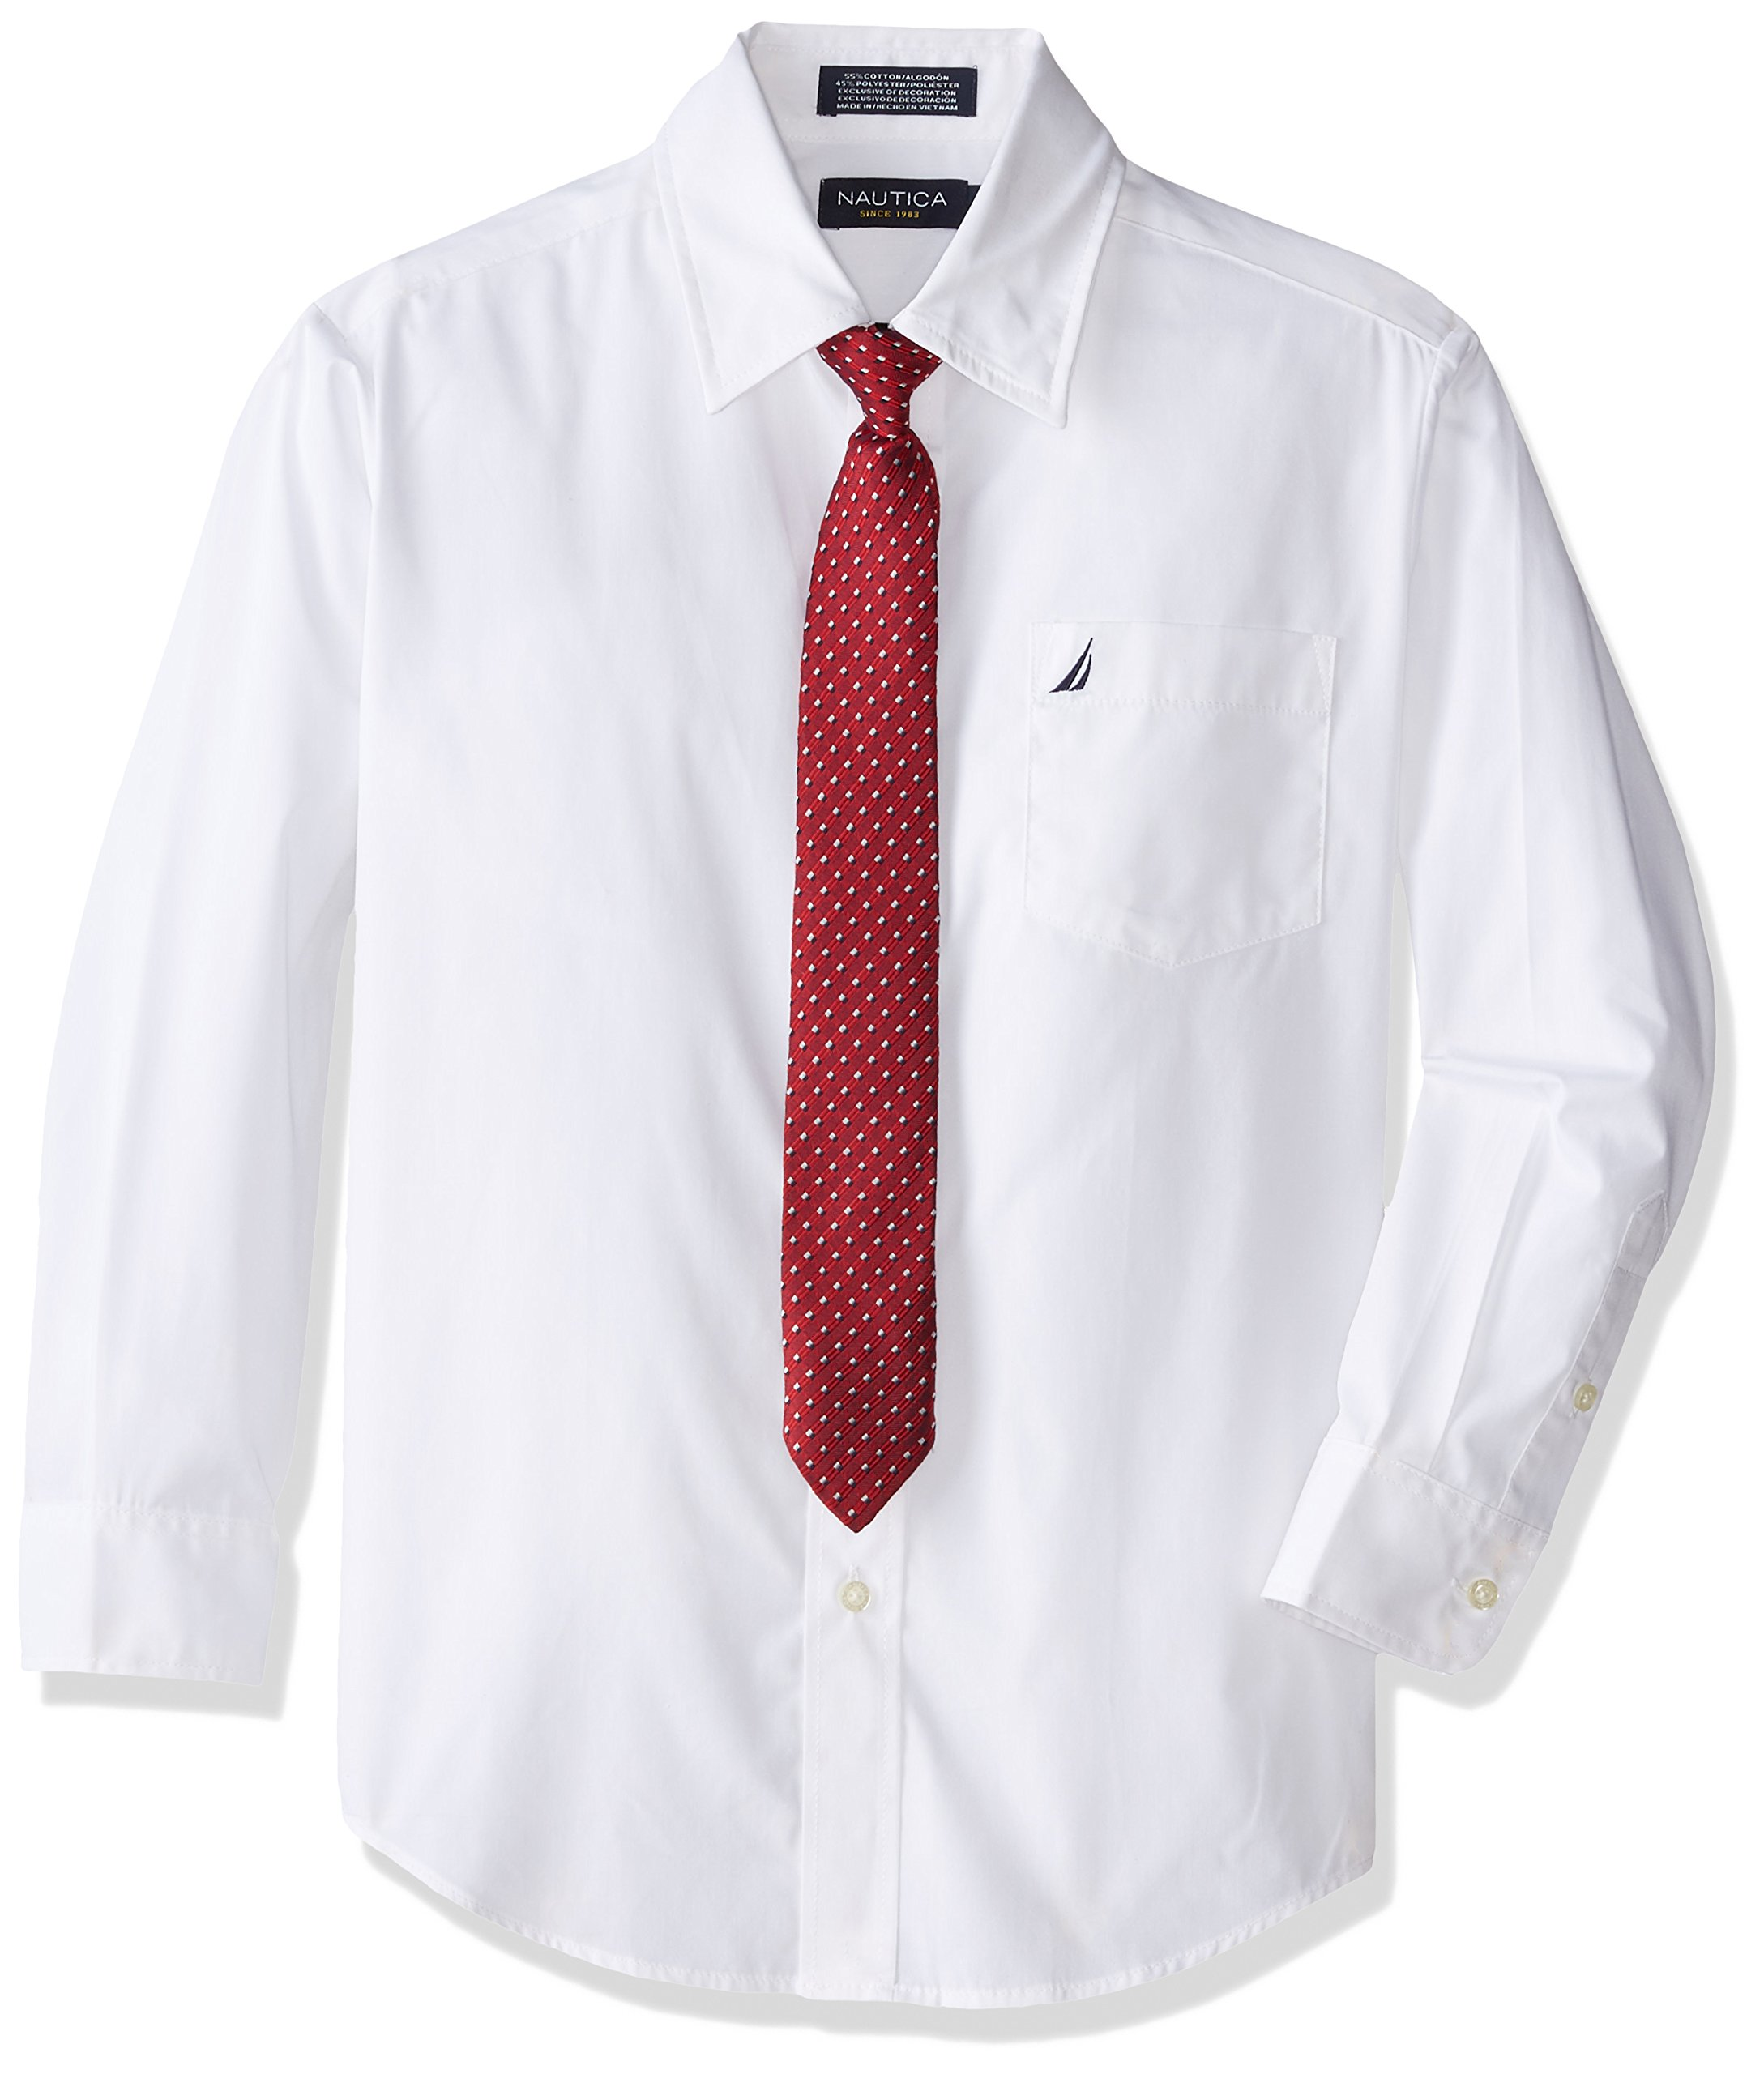 Nautica Dress Up Little Boys' Long Sleeve Solid Shirt, White, 6